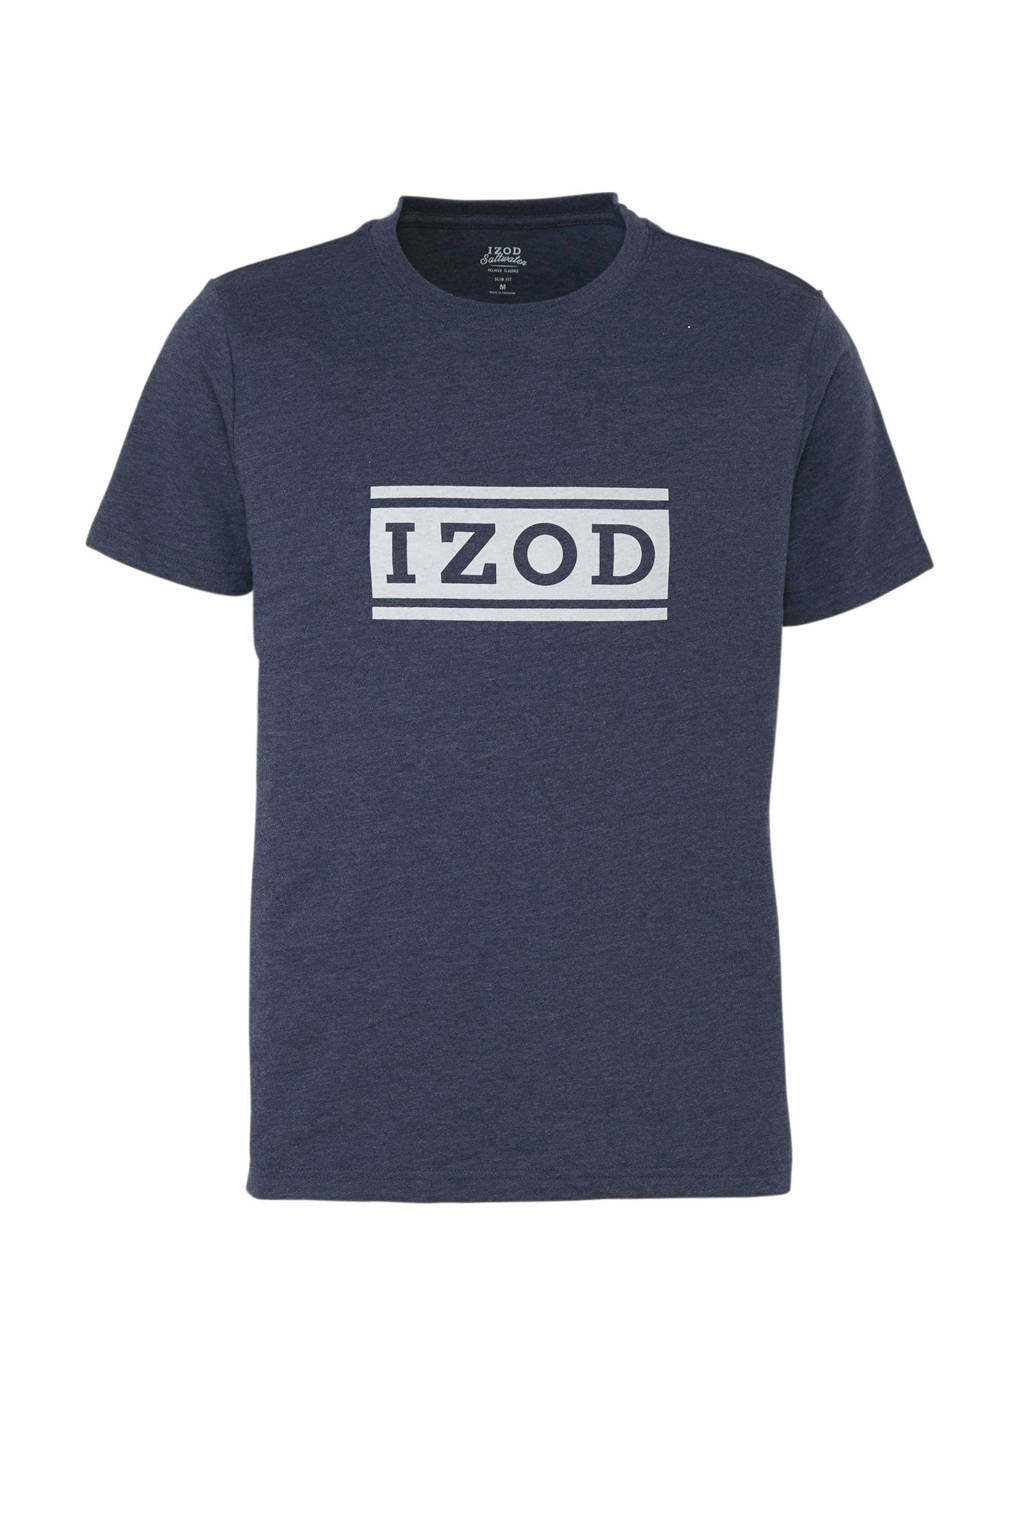 IZOD T-shirt met logo marine, Marine/wit